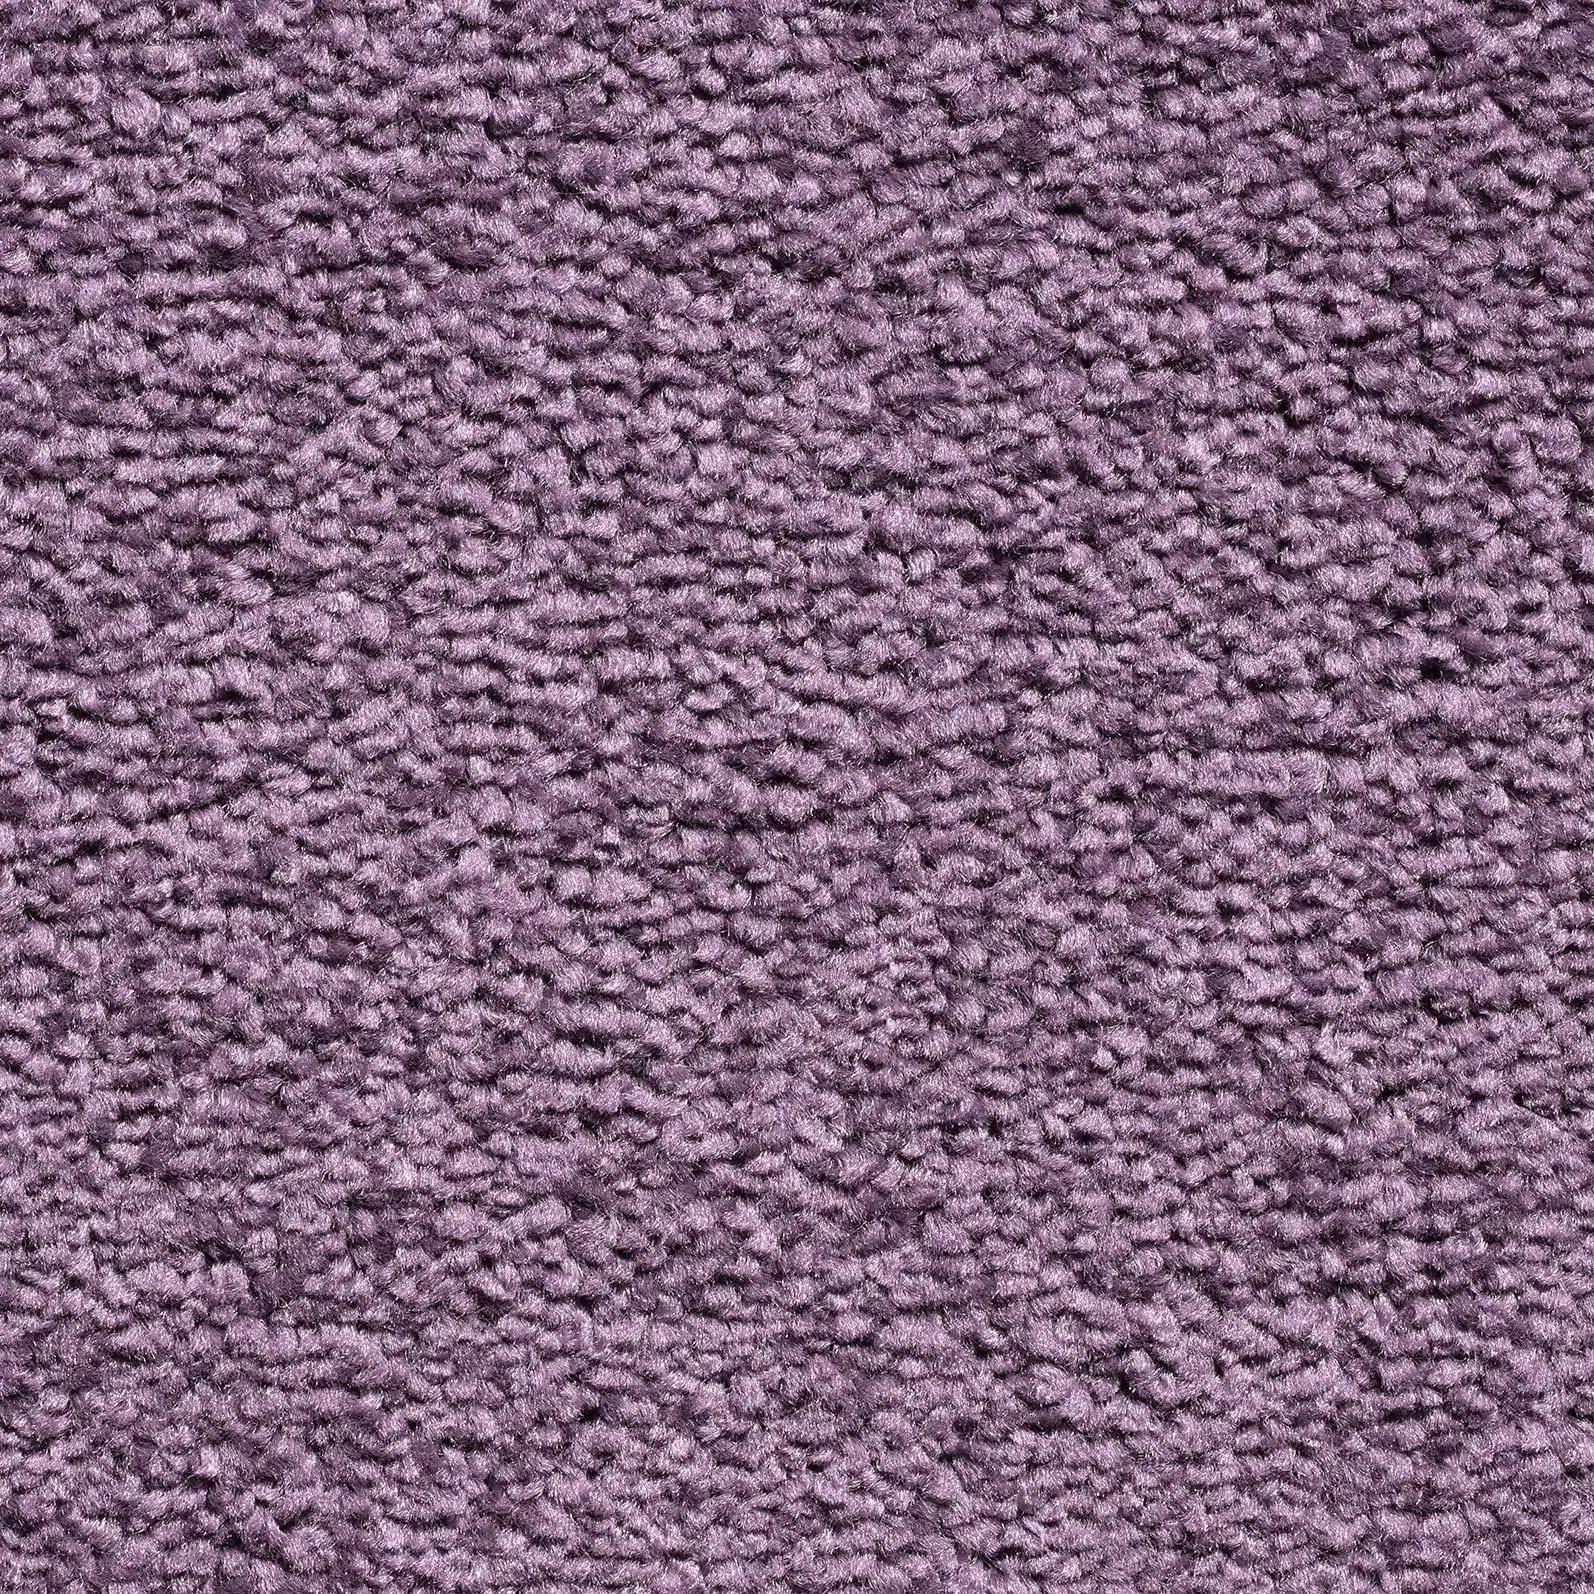 Carousel 115 Violet